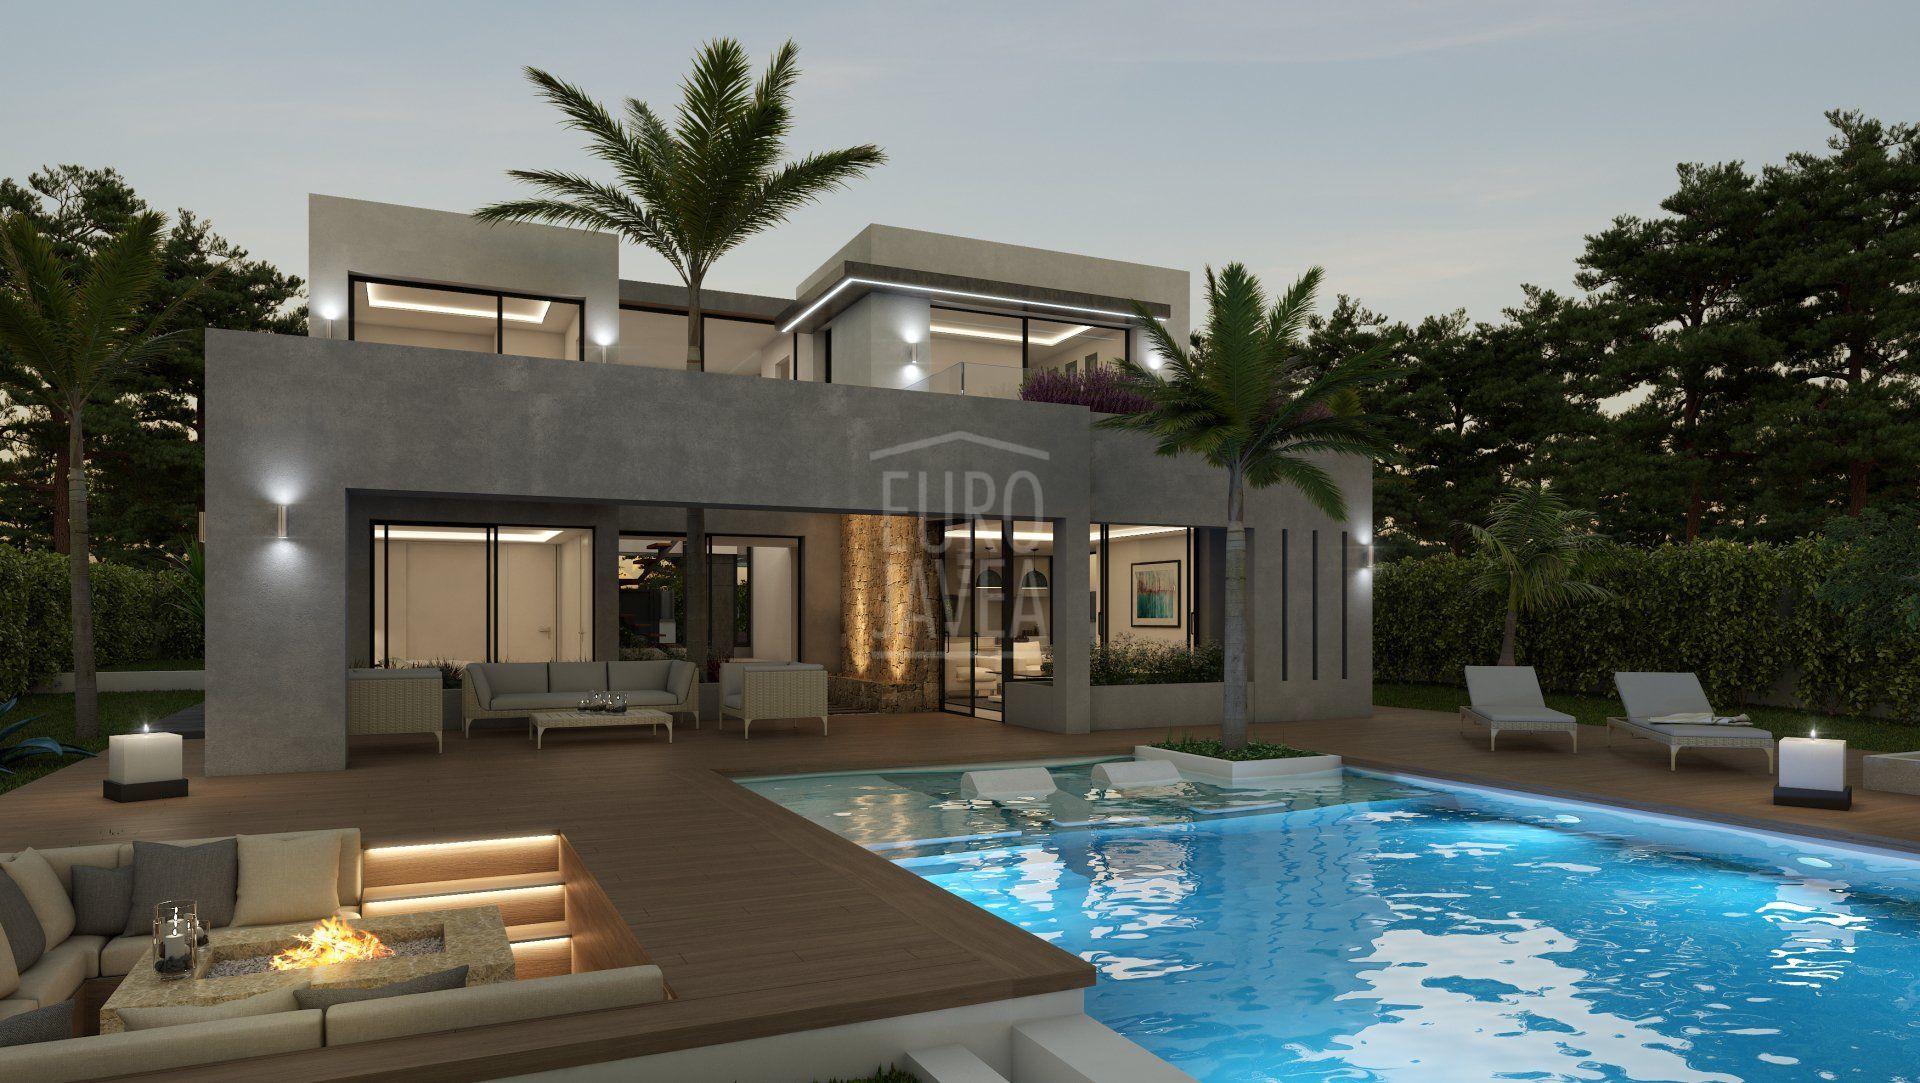 Project for sale in Jávea, under construction in the Costa Nova area